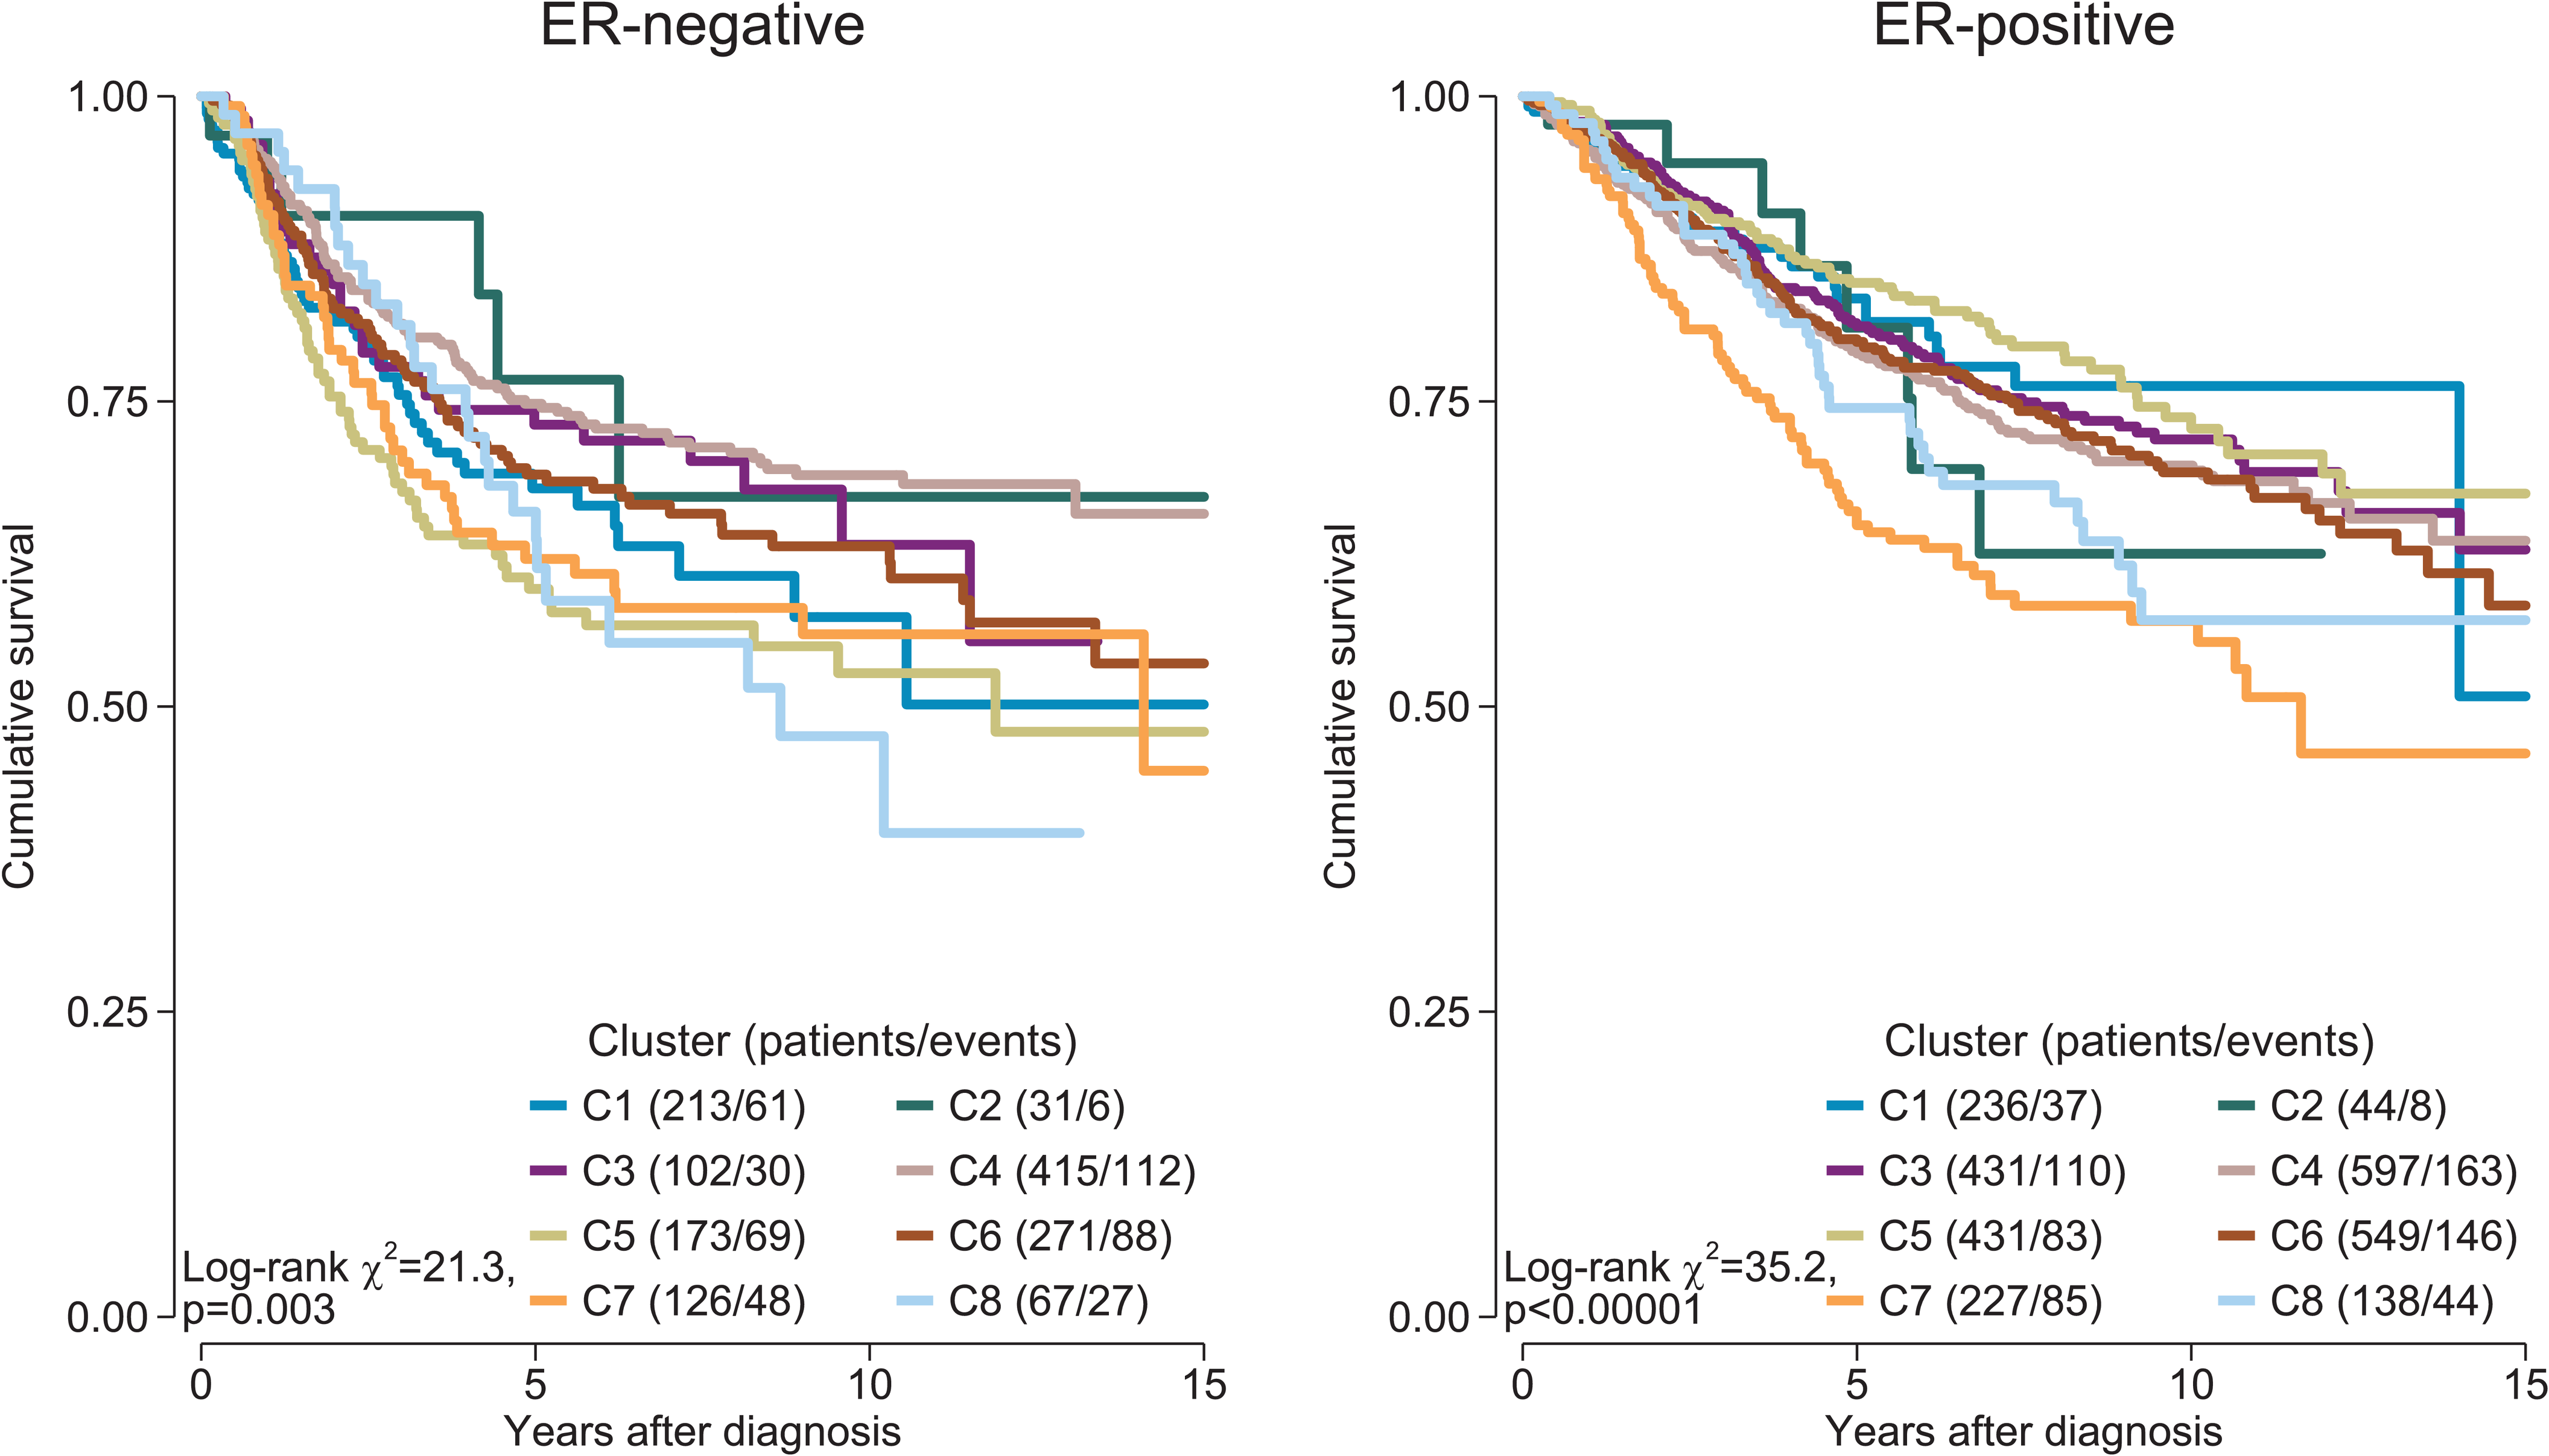 Survival plots by cluster separately for ER-positive and ER-negative disease.